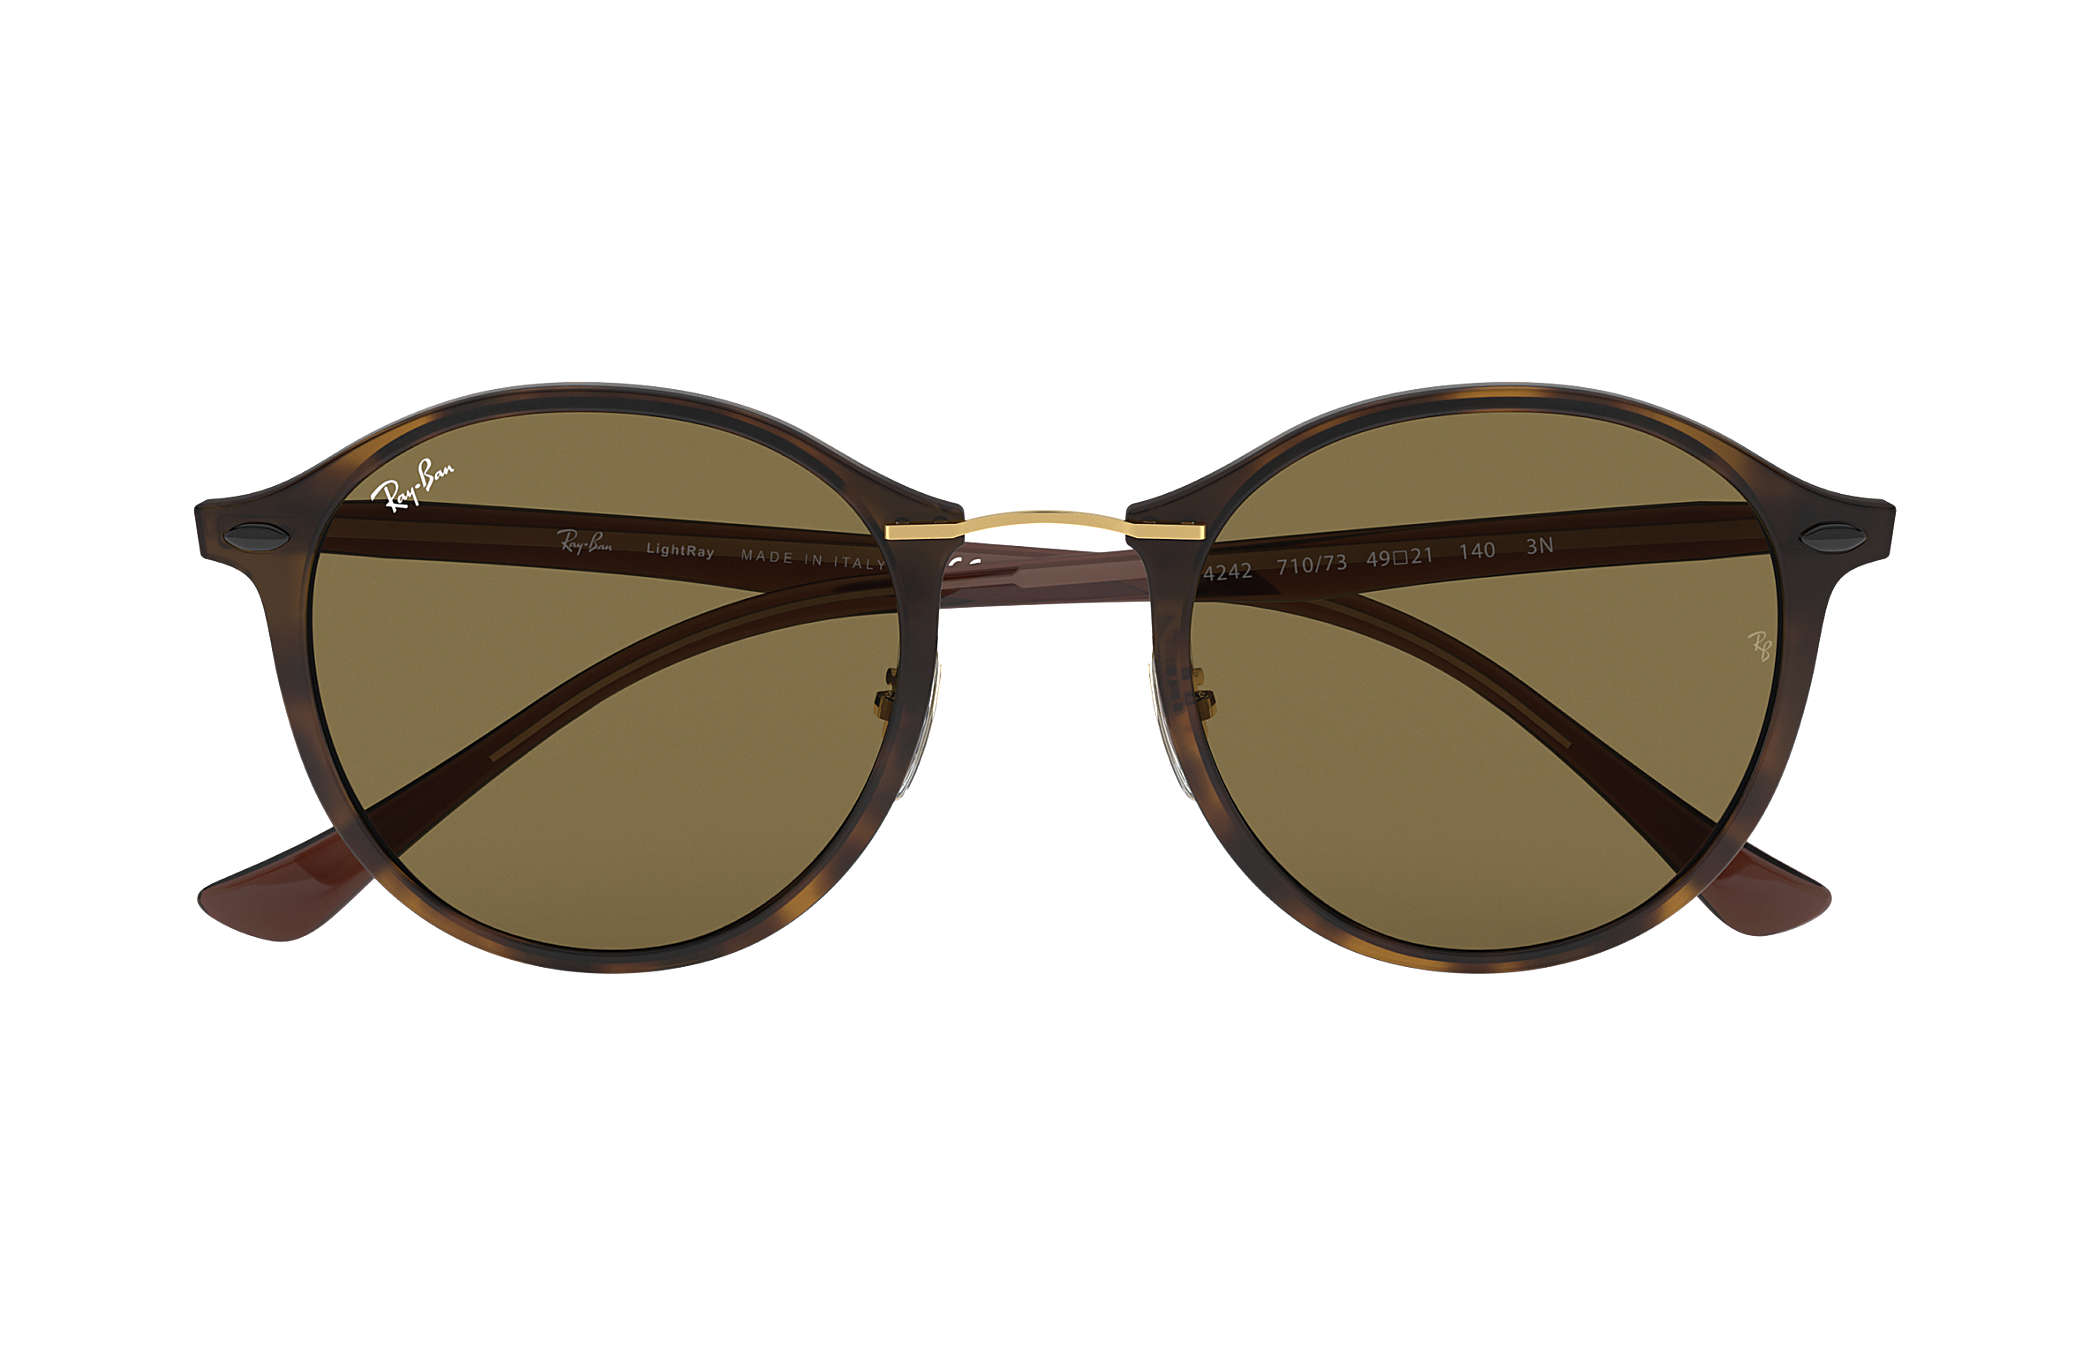 Fashion sunglasses online store 77